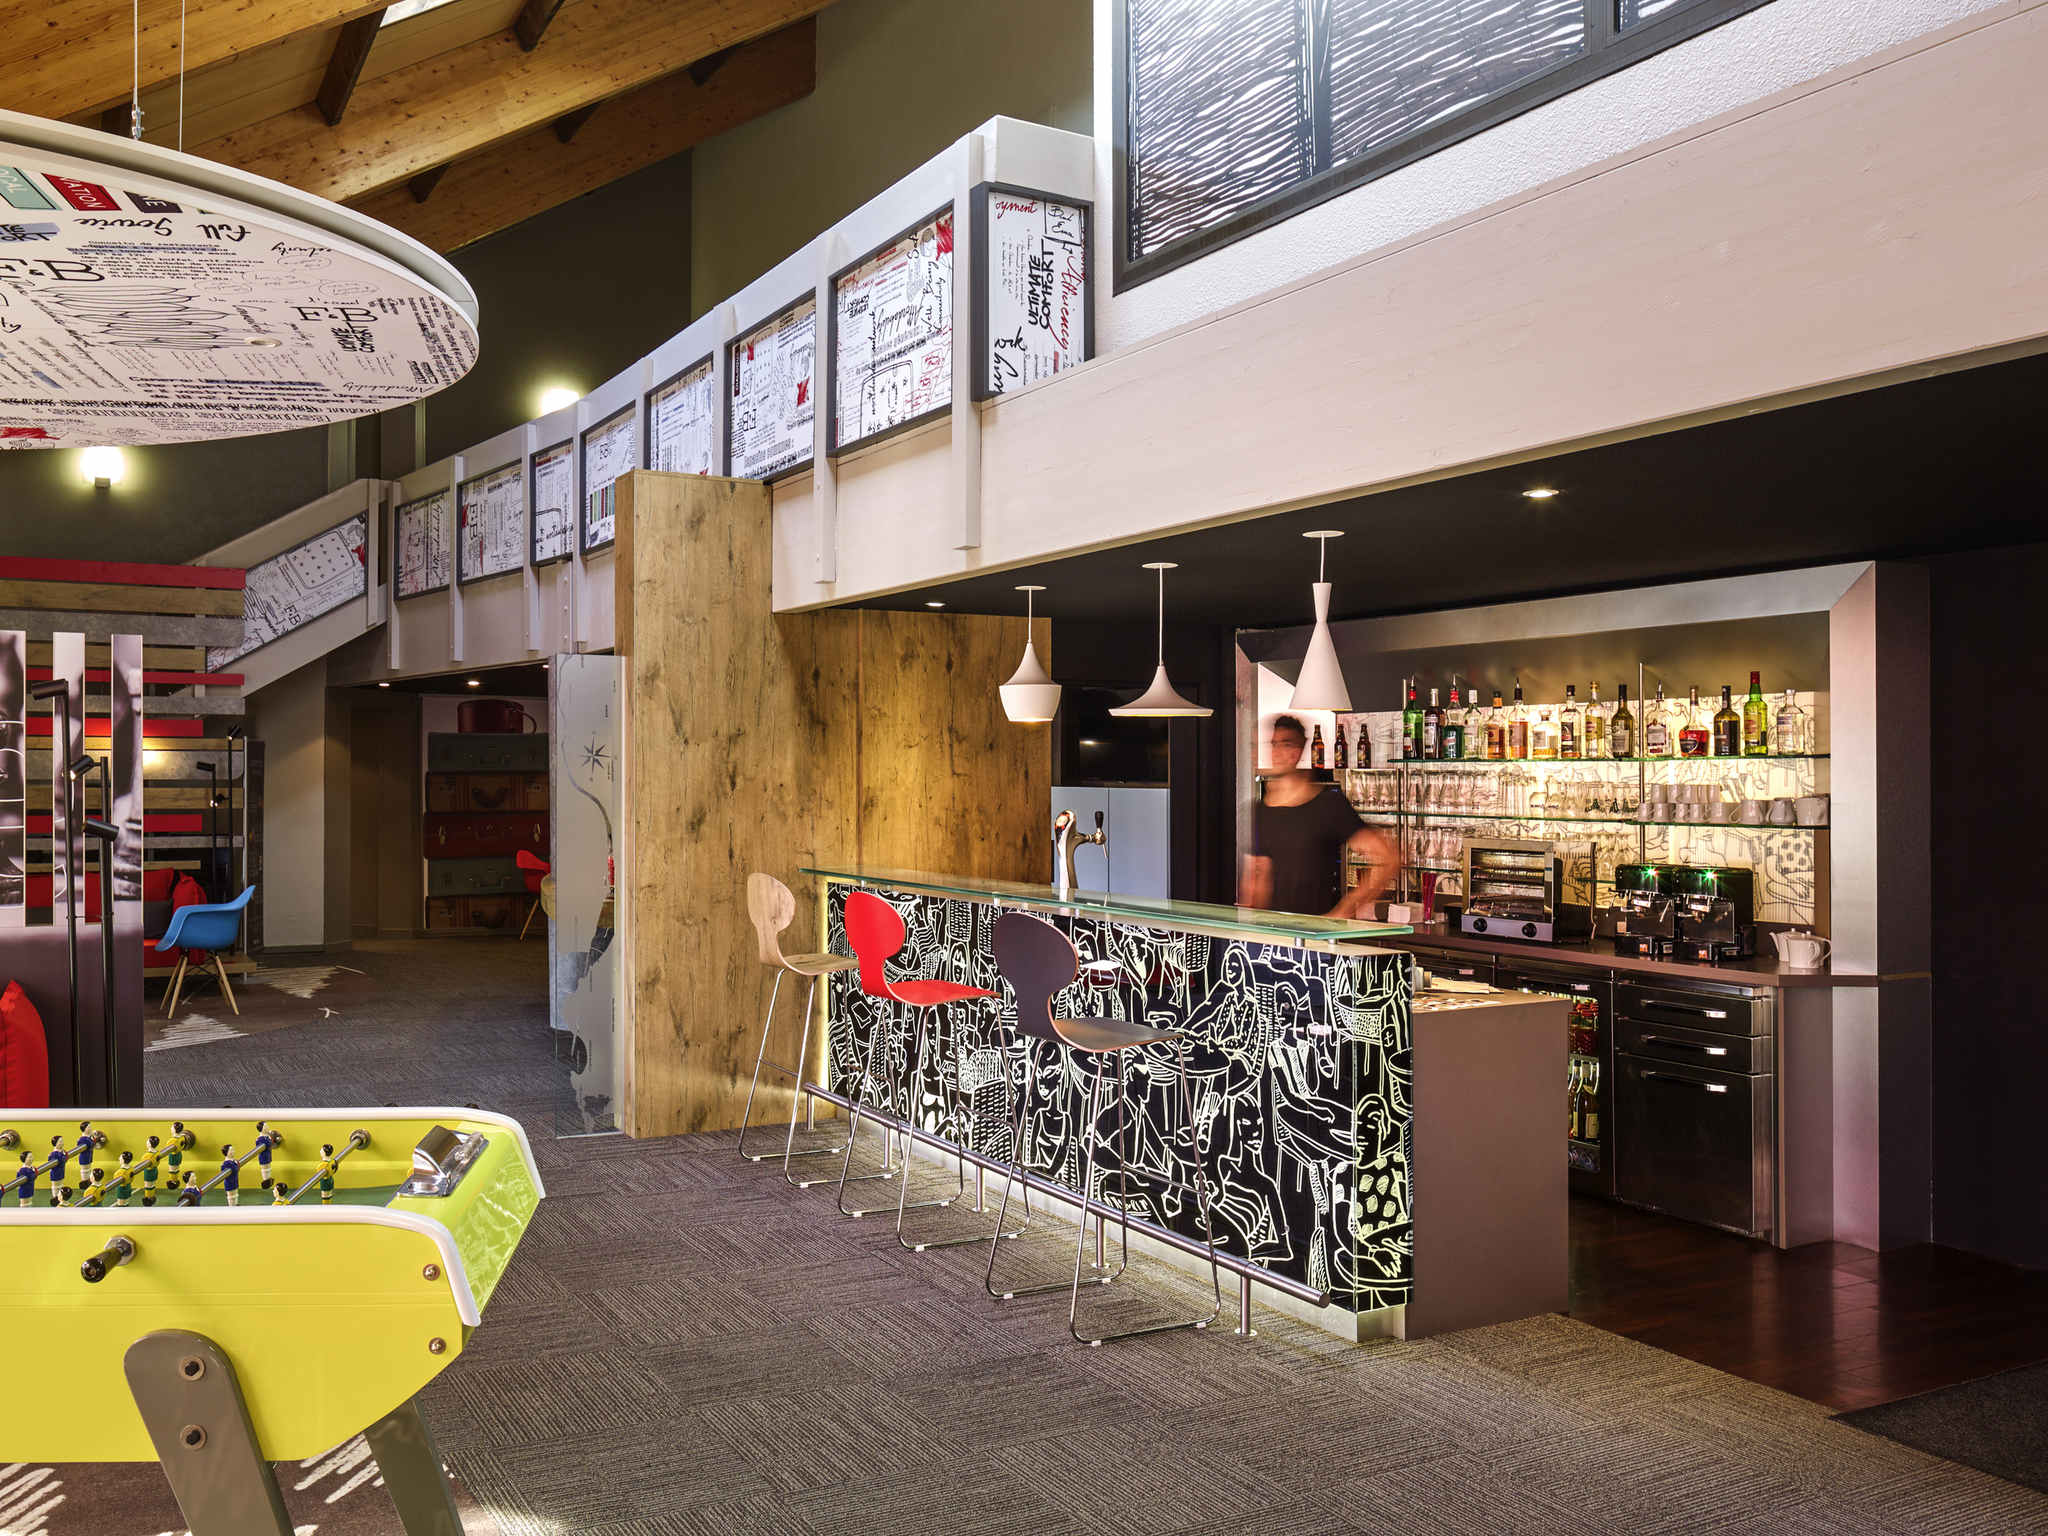 hotel in trignac ibis saint nazaire trignac. Black Bedroom Furniture Sets. Home Design Ideas